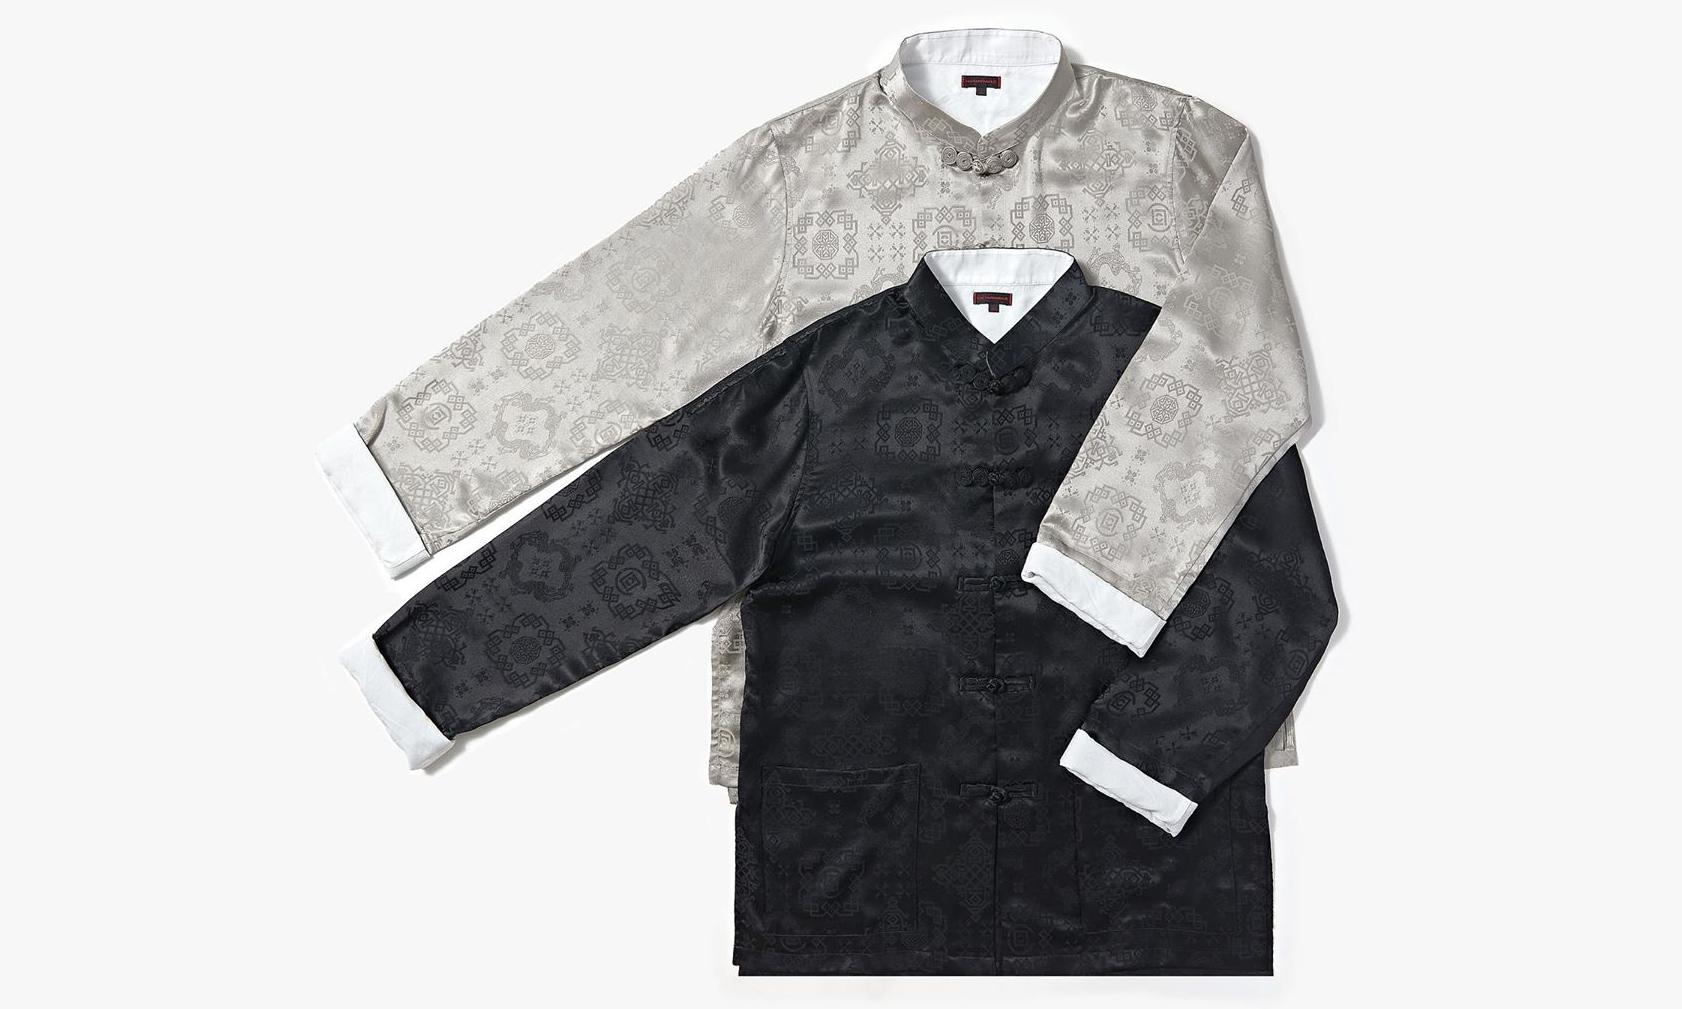 TRANSFER 独占 CLOT 丝绸夹克预告发布